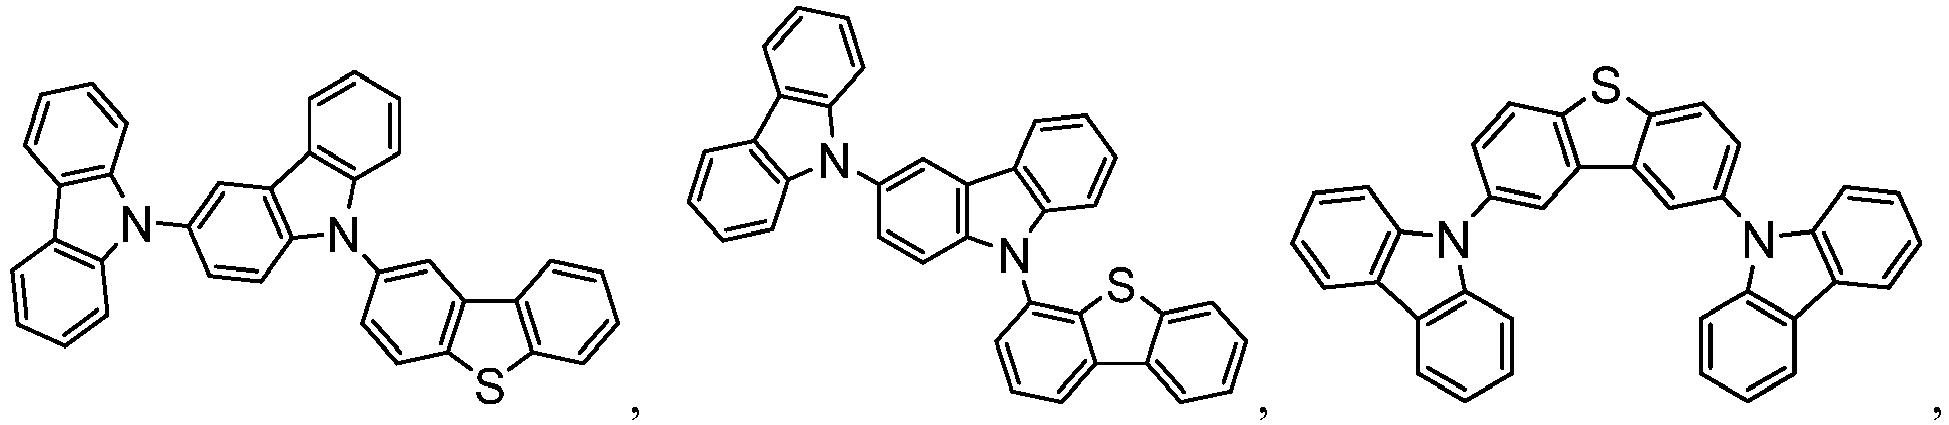 Figure imgb0885